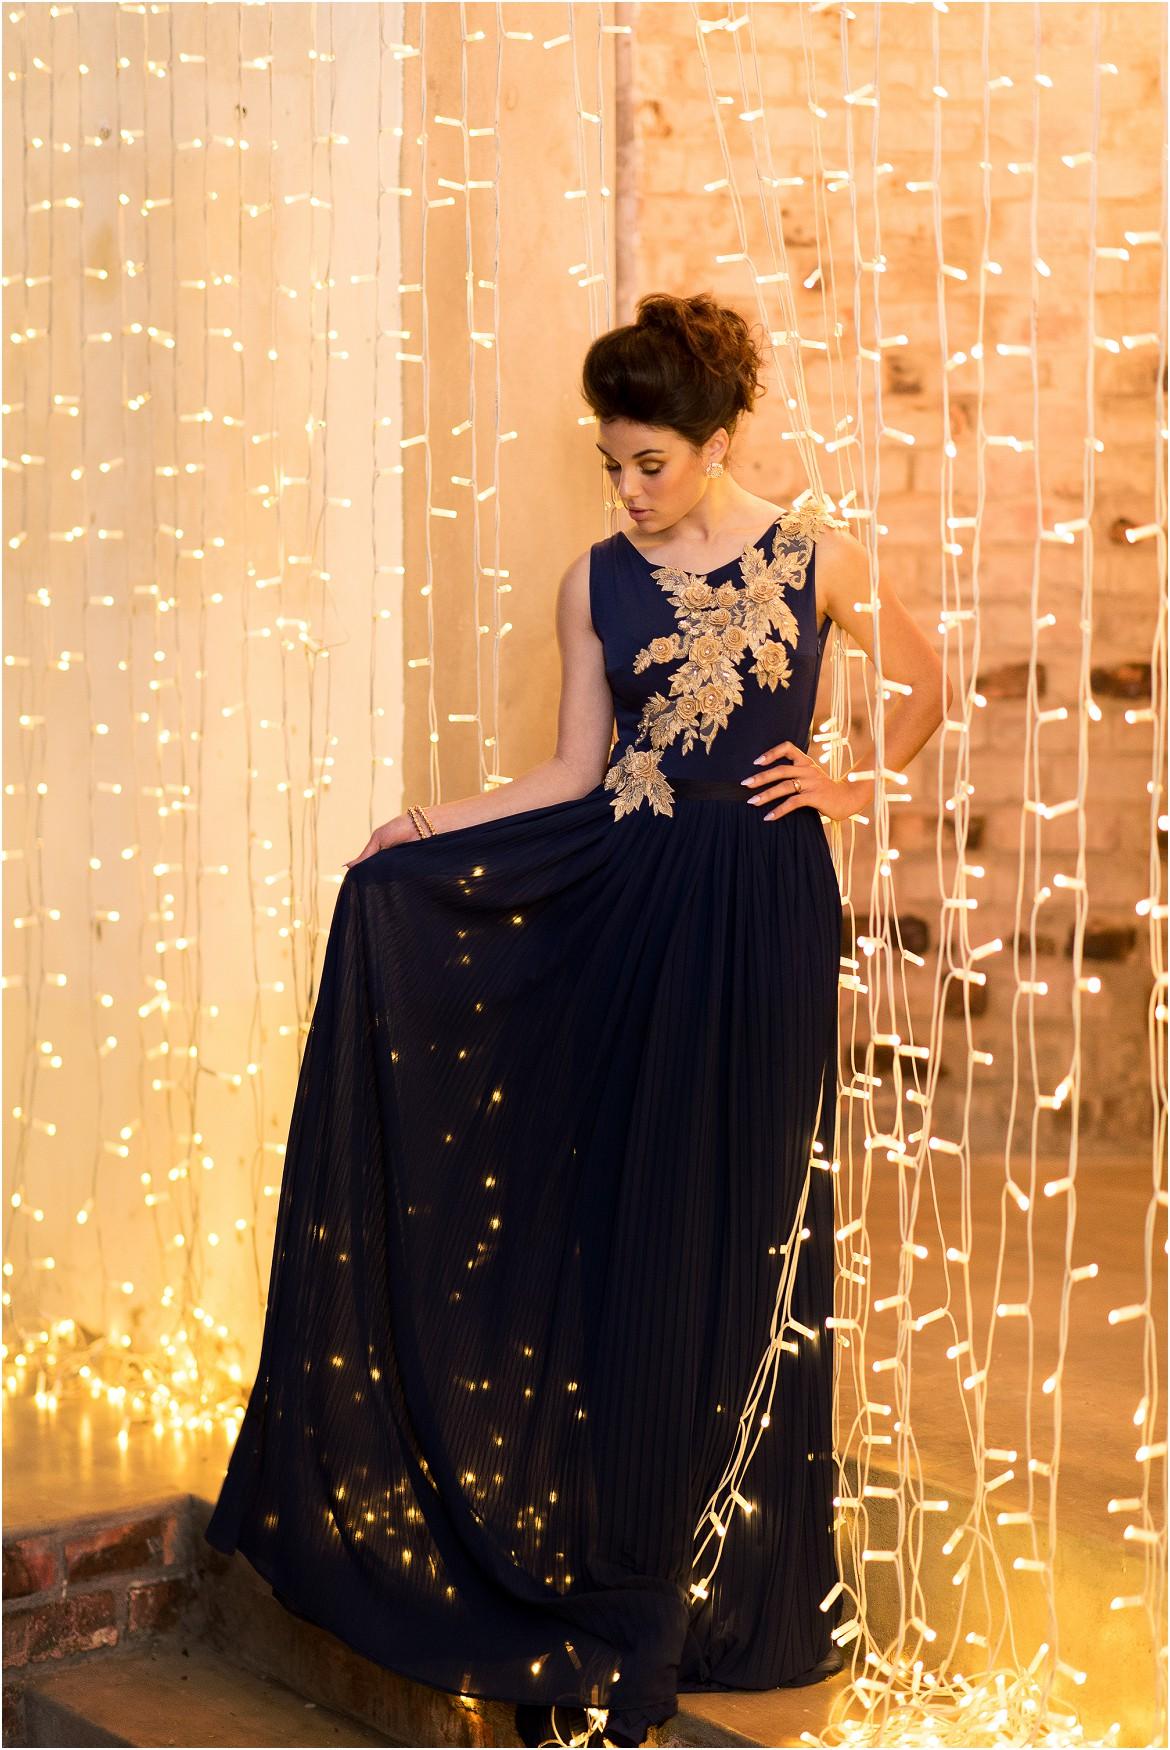 SamanthaClifton-StarryNights-BridalStyle-StyledShoot-010